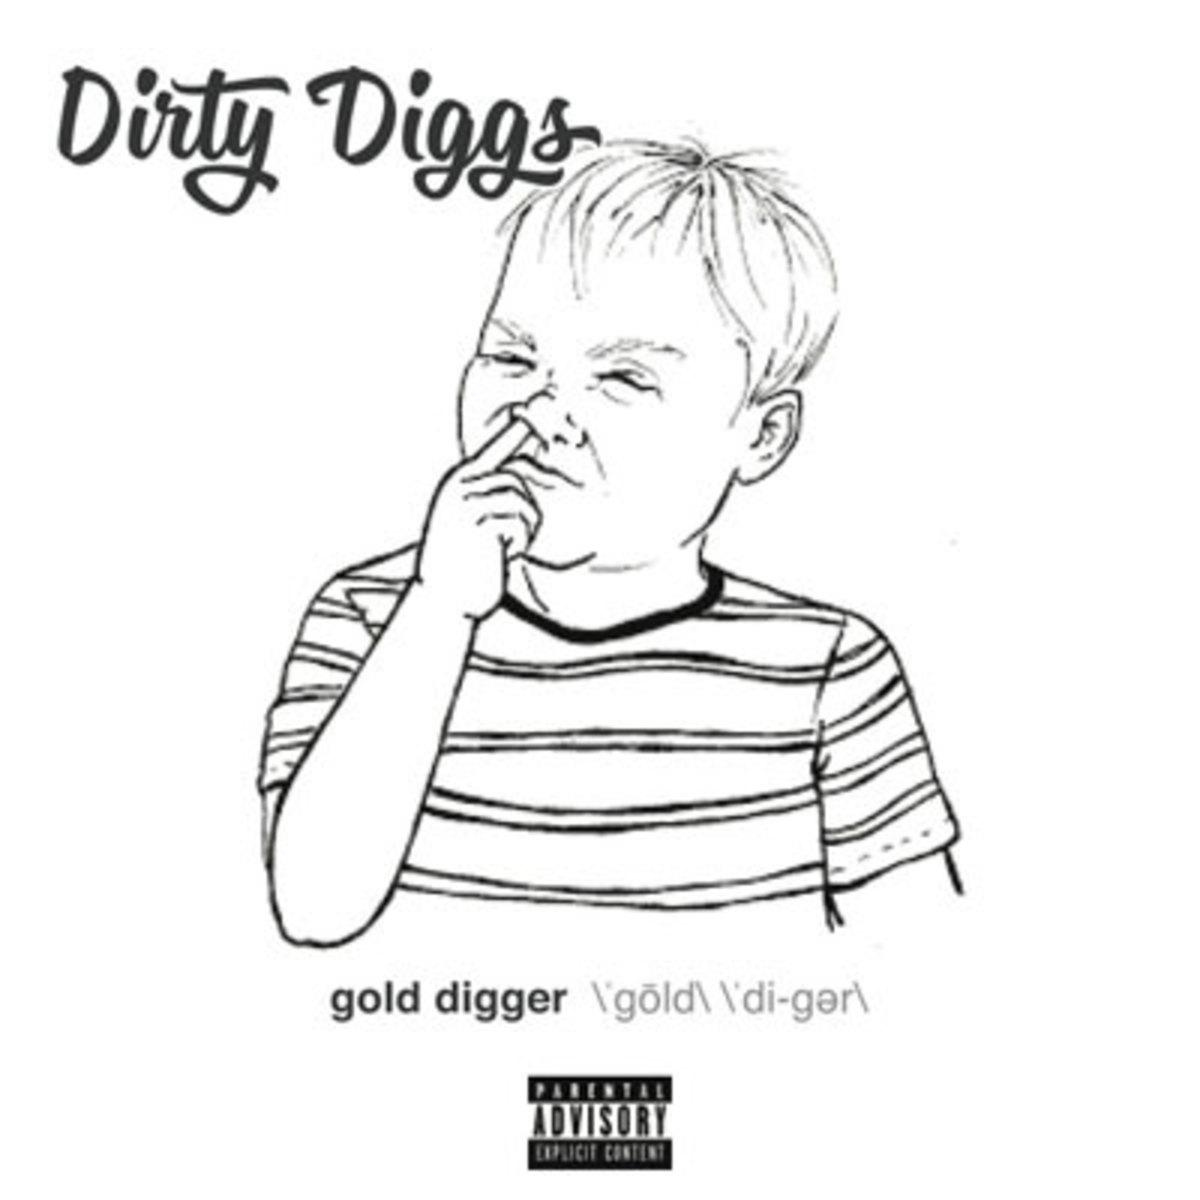 dirtydiggs-golddigger.jpg